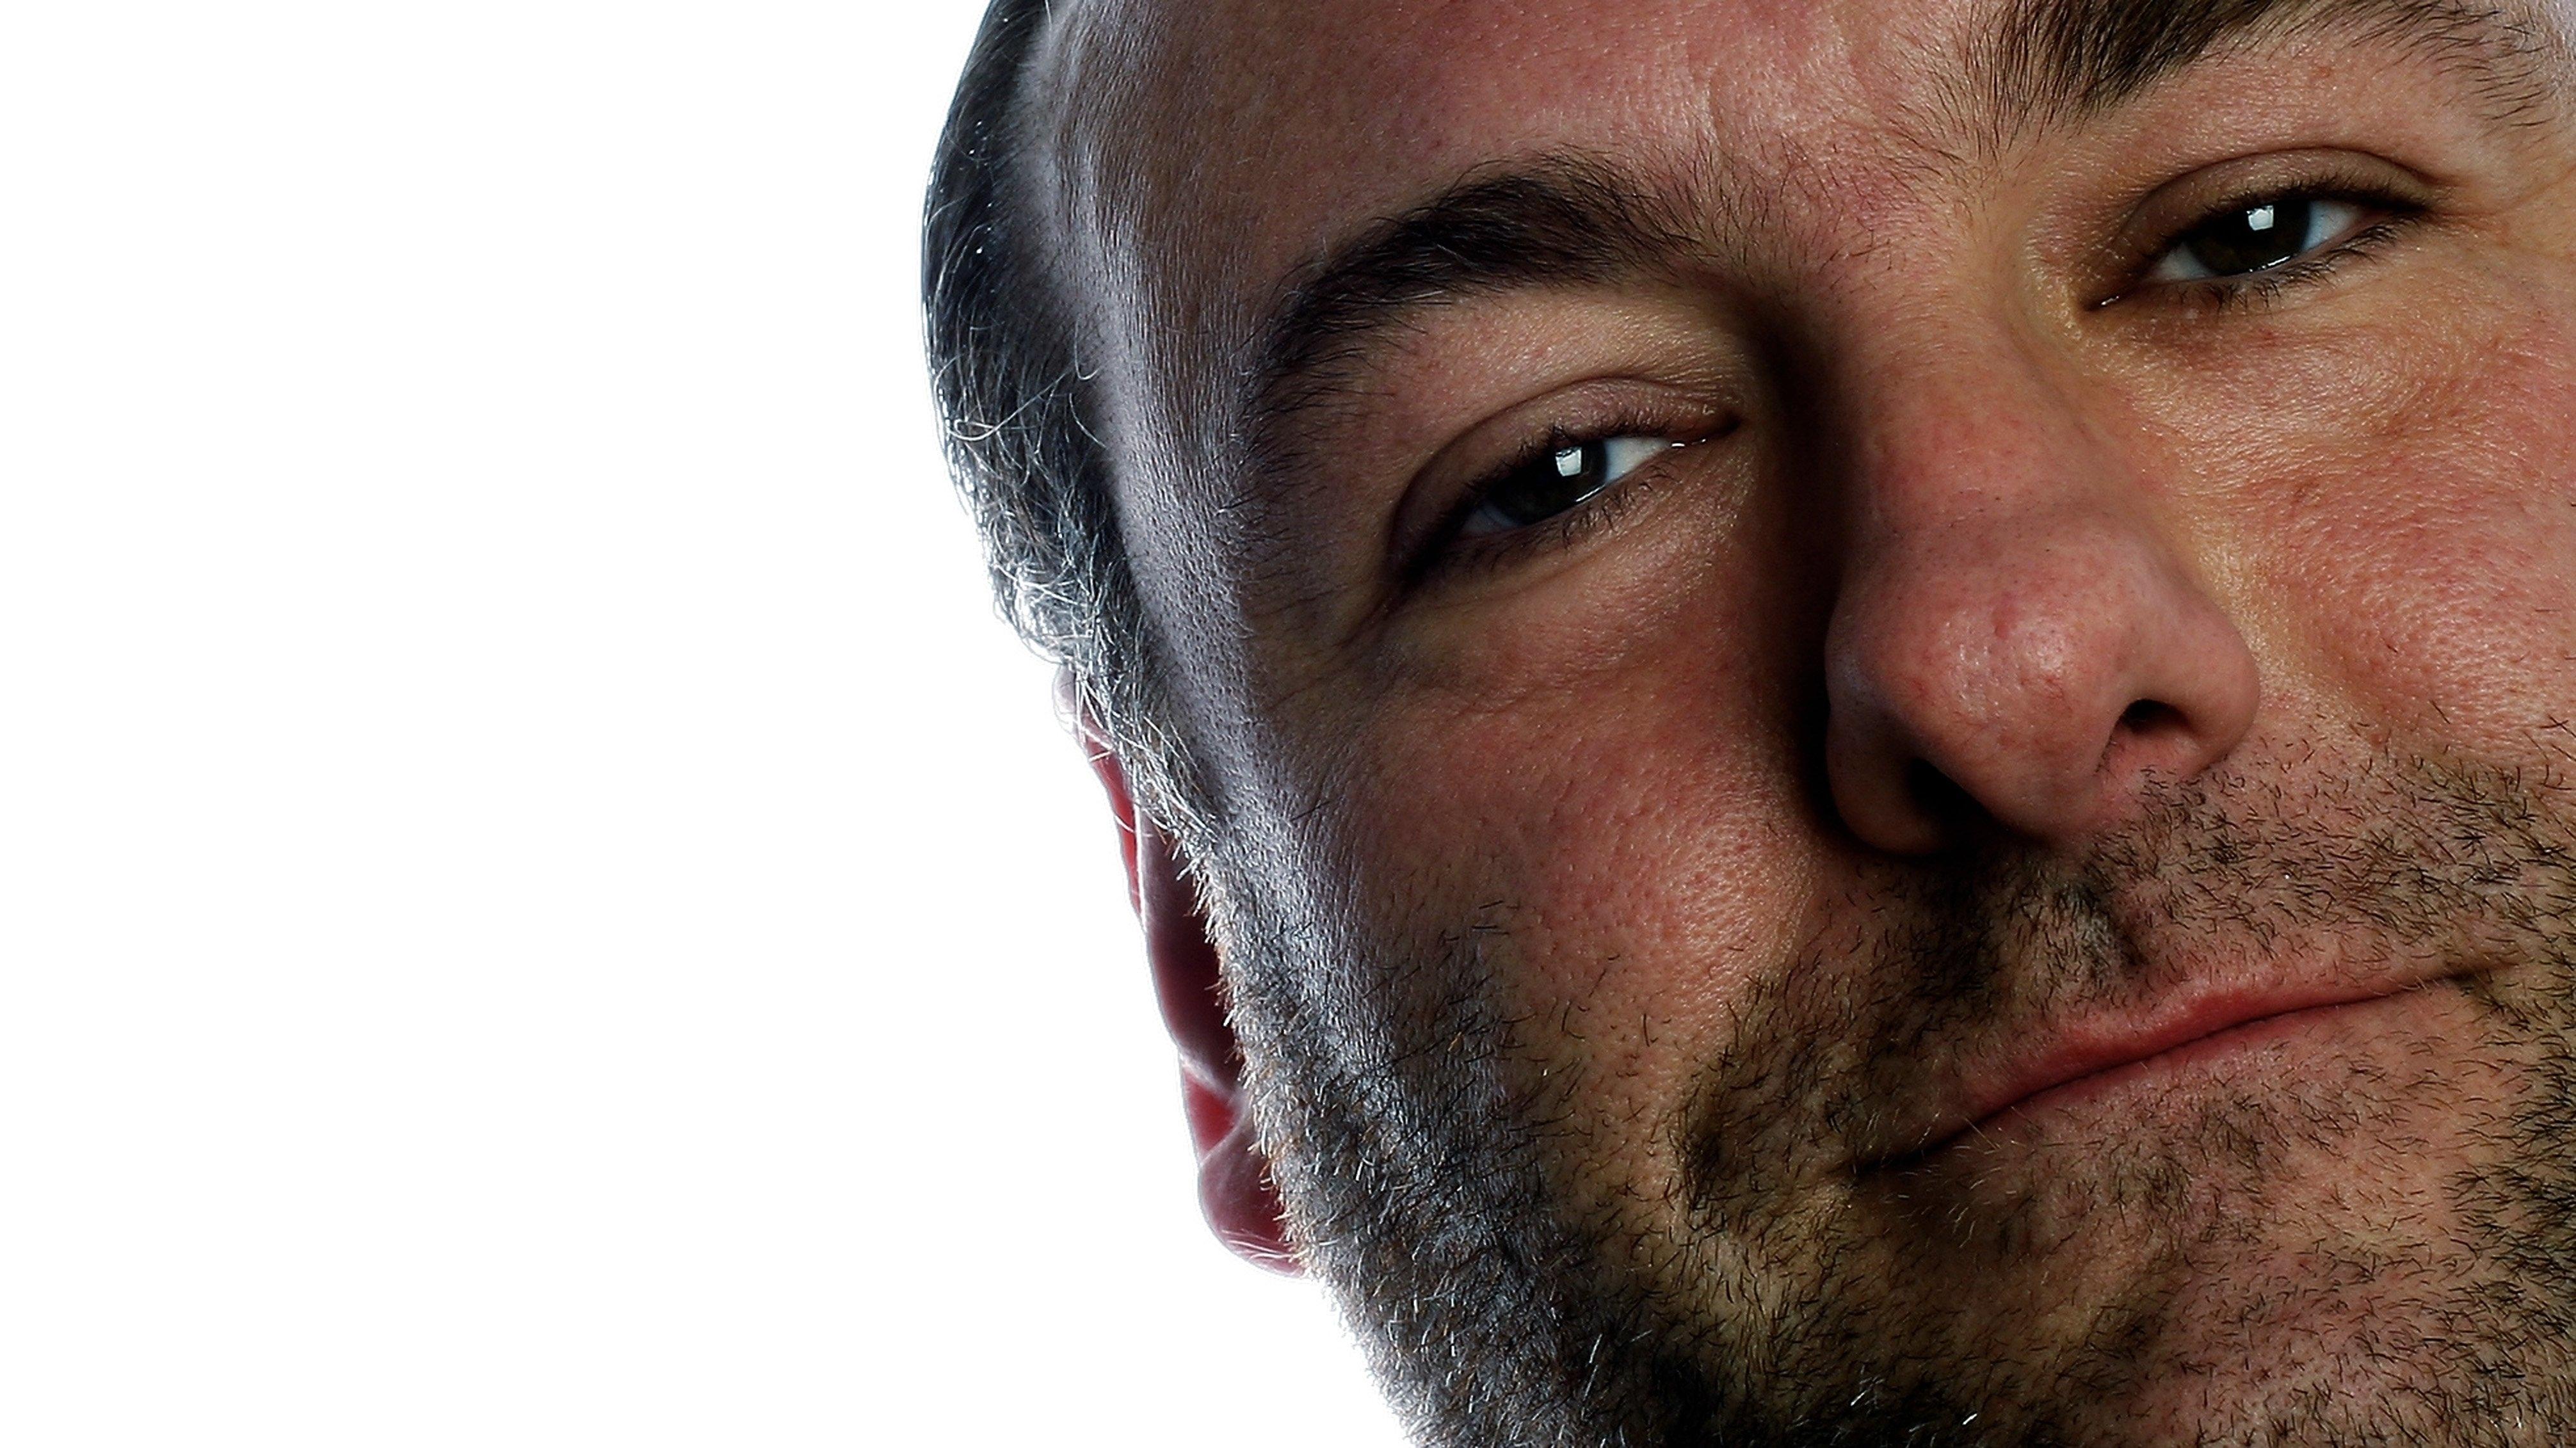 9 tributes to James Gandolfini from Sopranos cast members